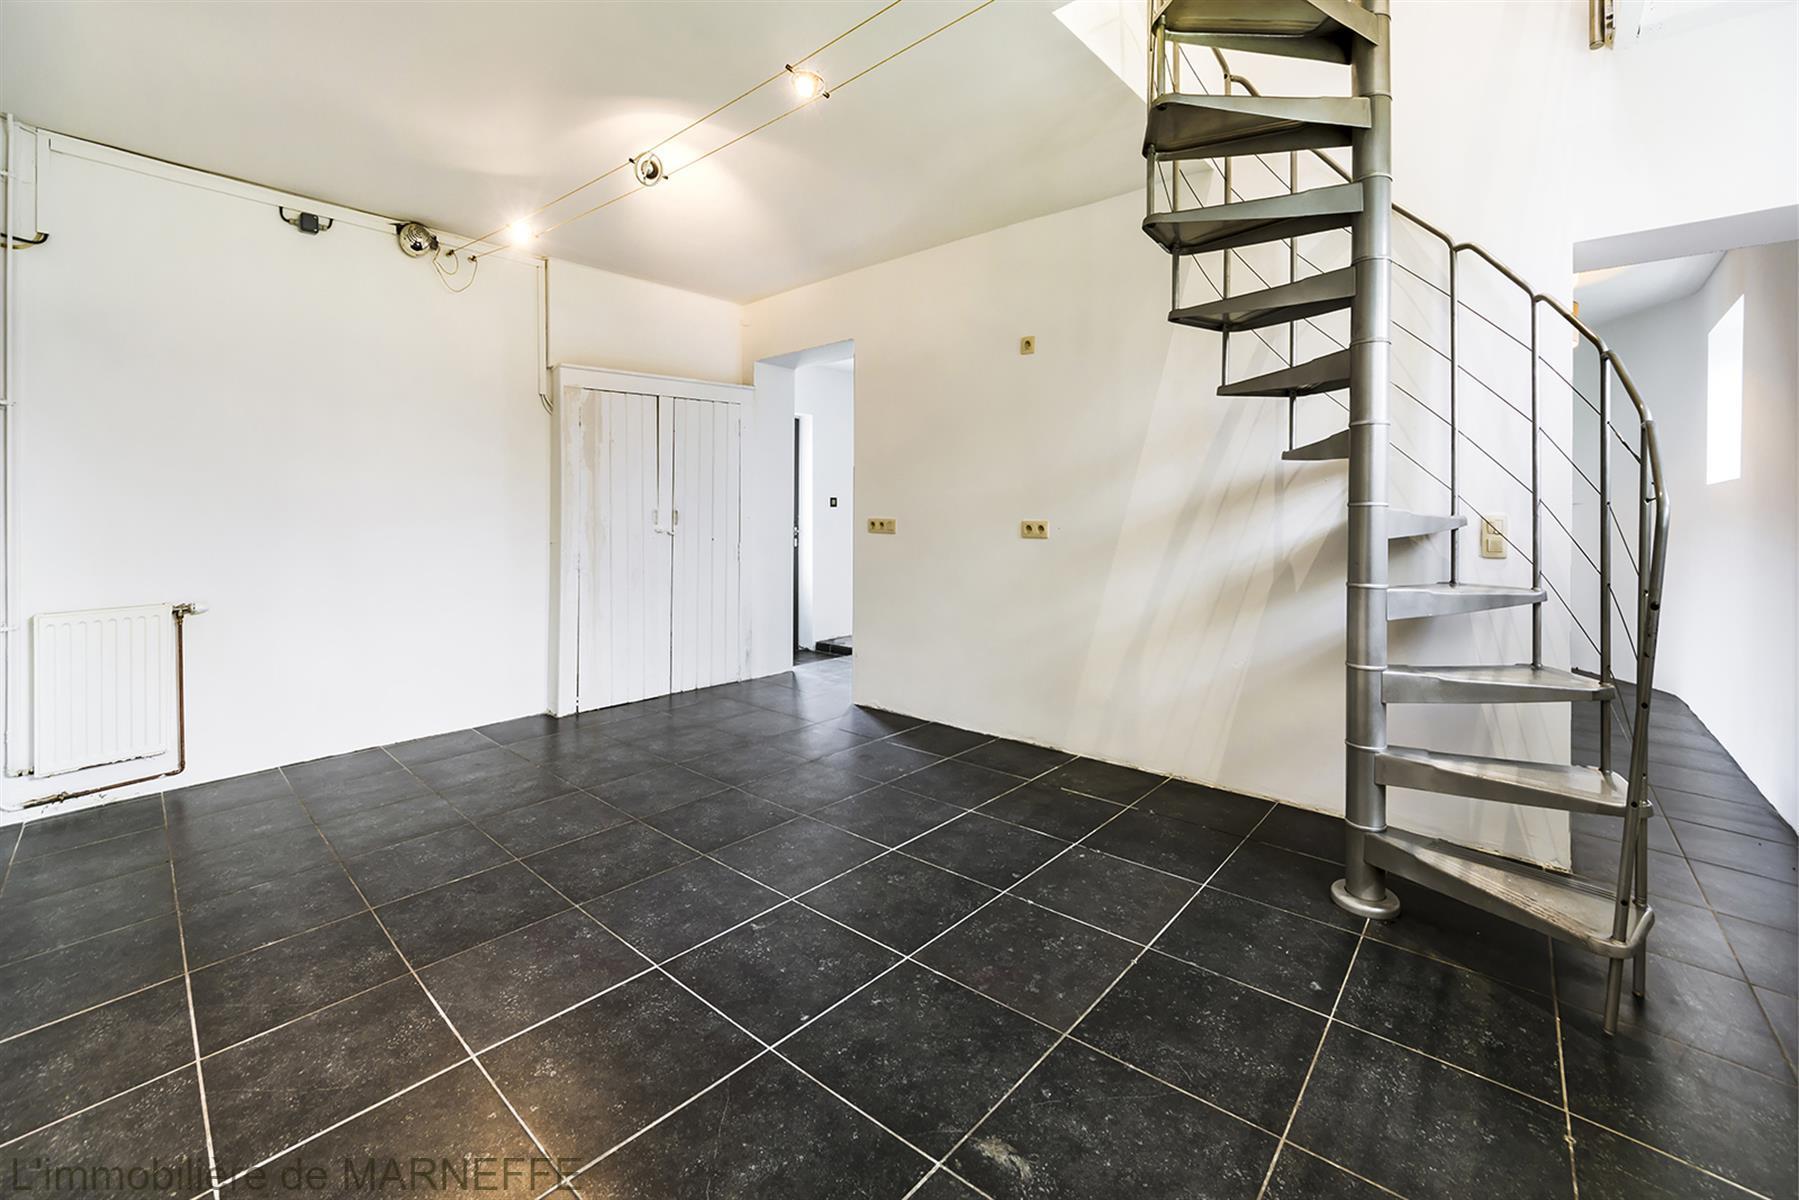 Maison - Oreye Bergilers - #3614650-2